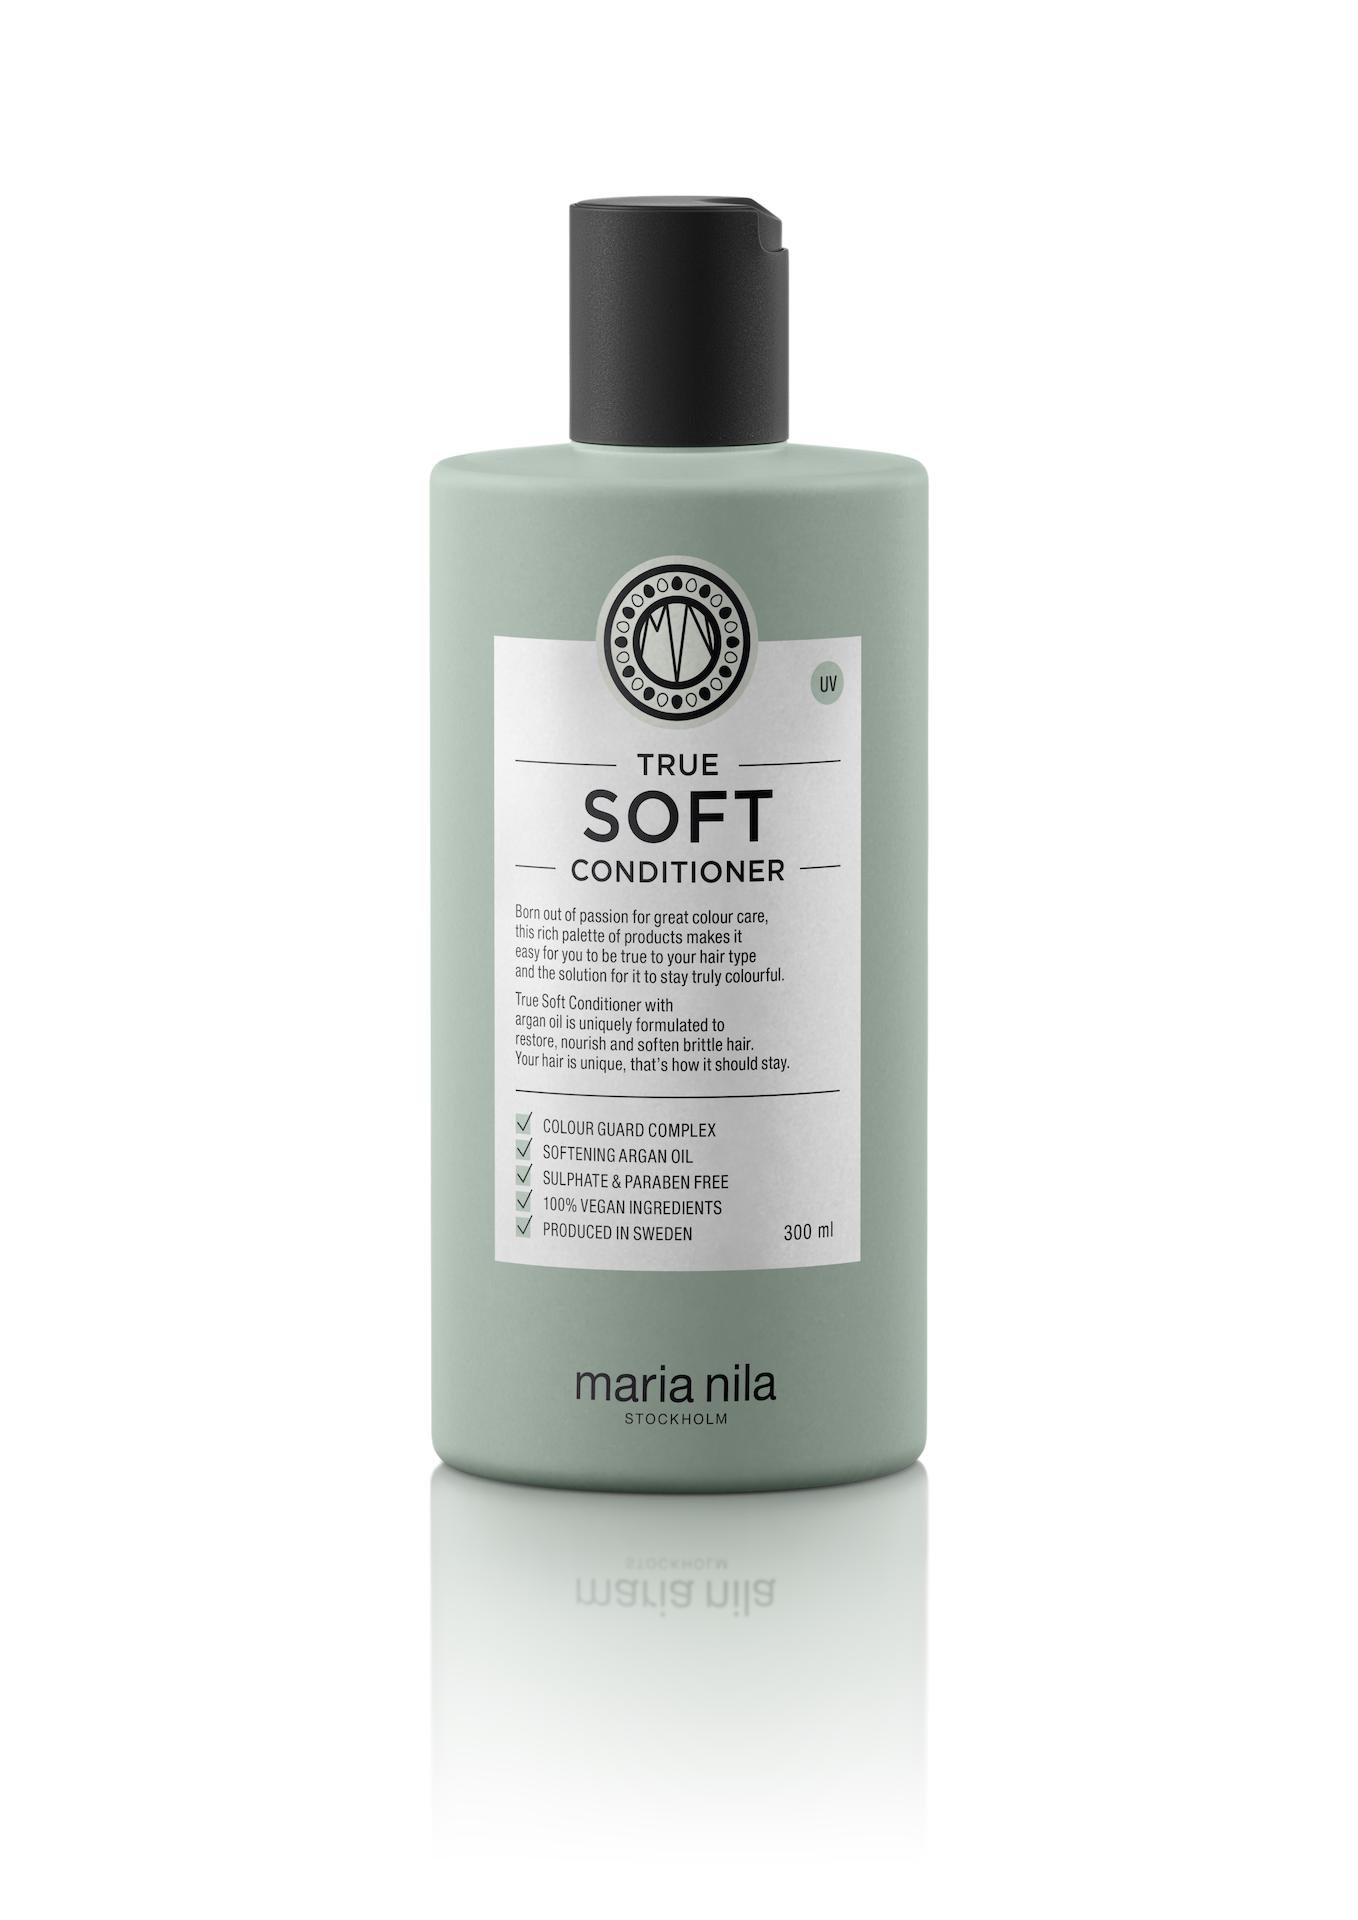 True Soft Conditioner 300ml